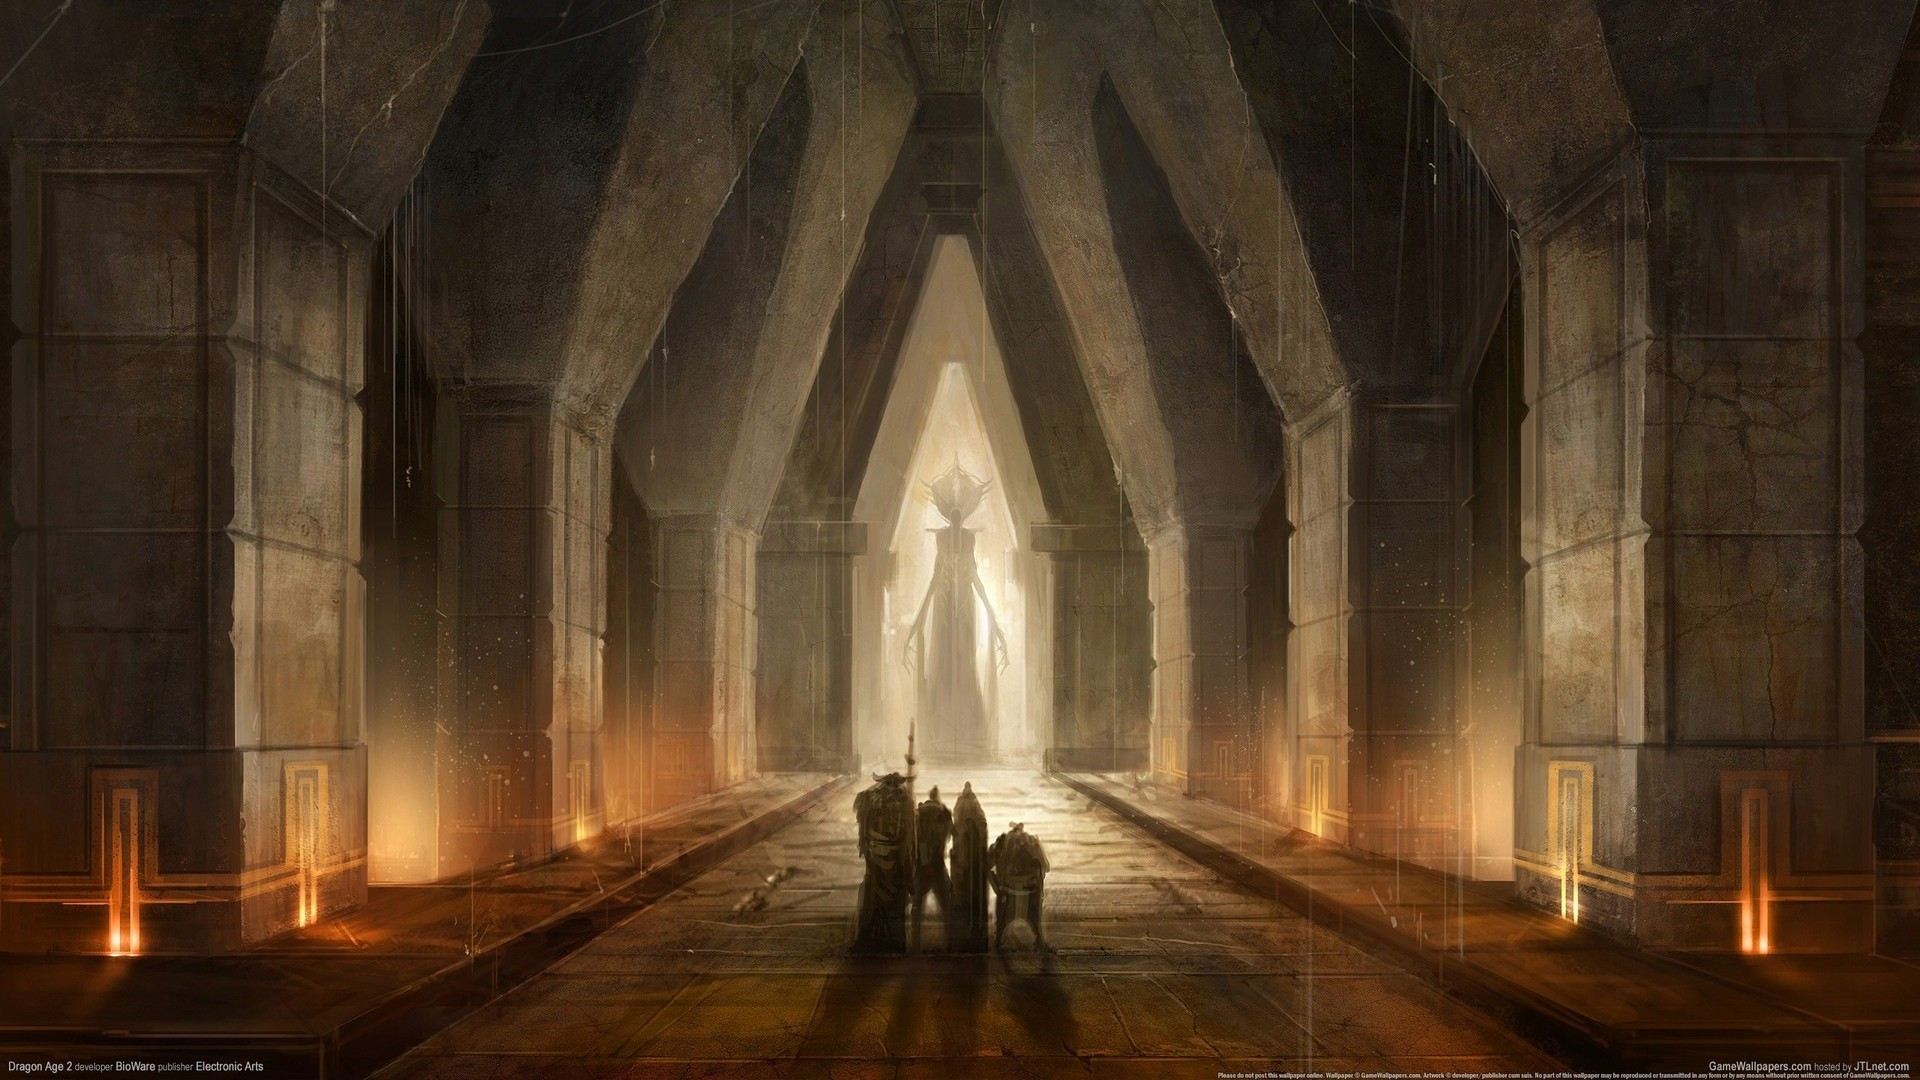 Dragon Age 2 HD wallpapers #8 – 1920×1080.